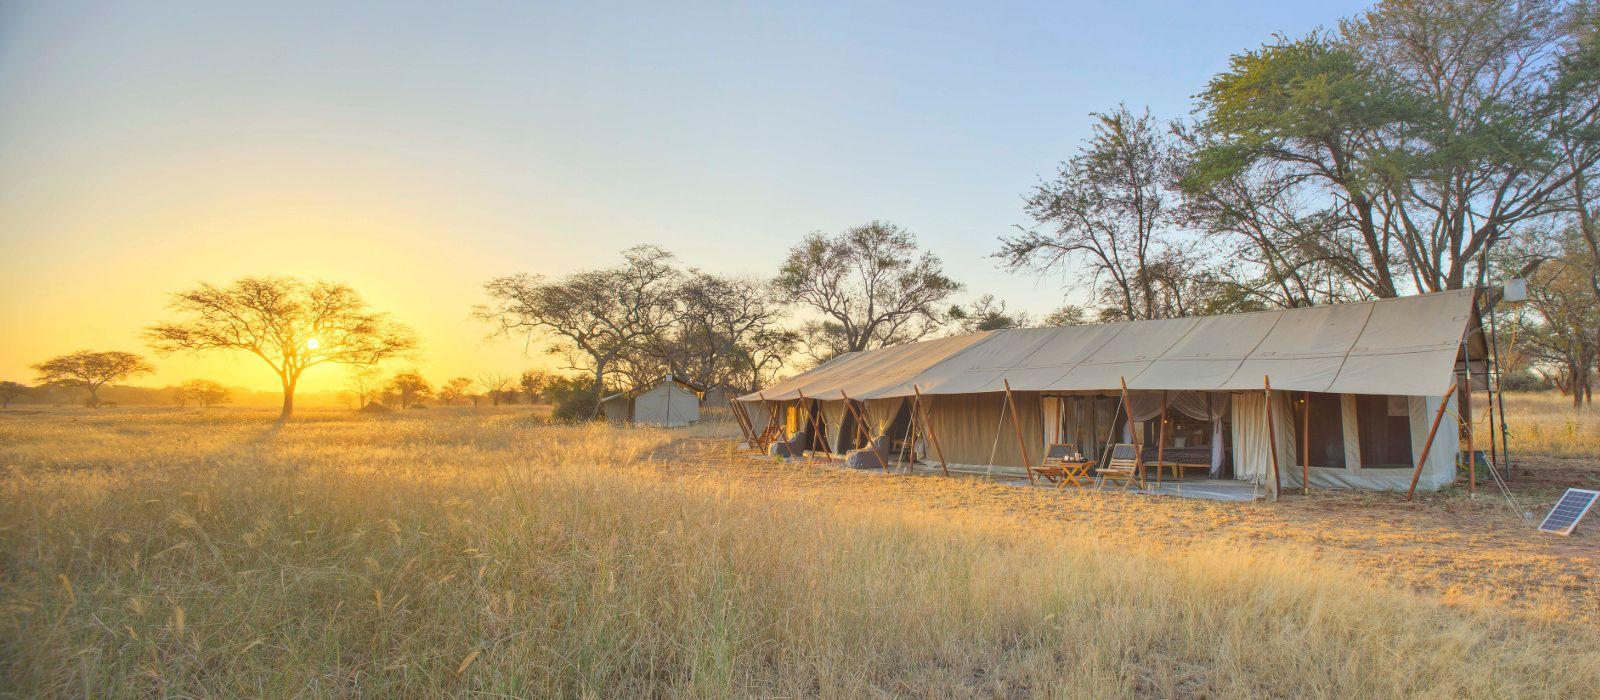 Hotel Ubuntu Migration Camp Tansania